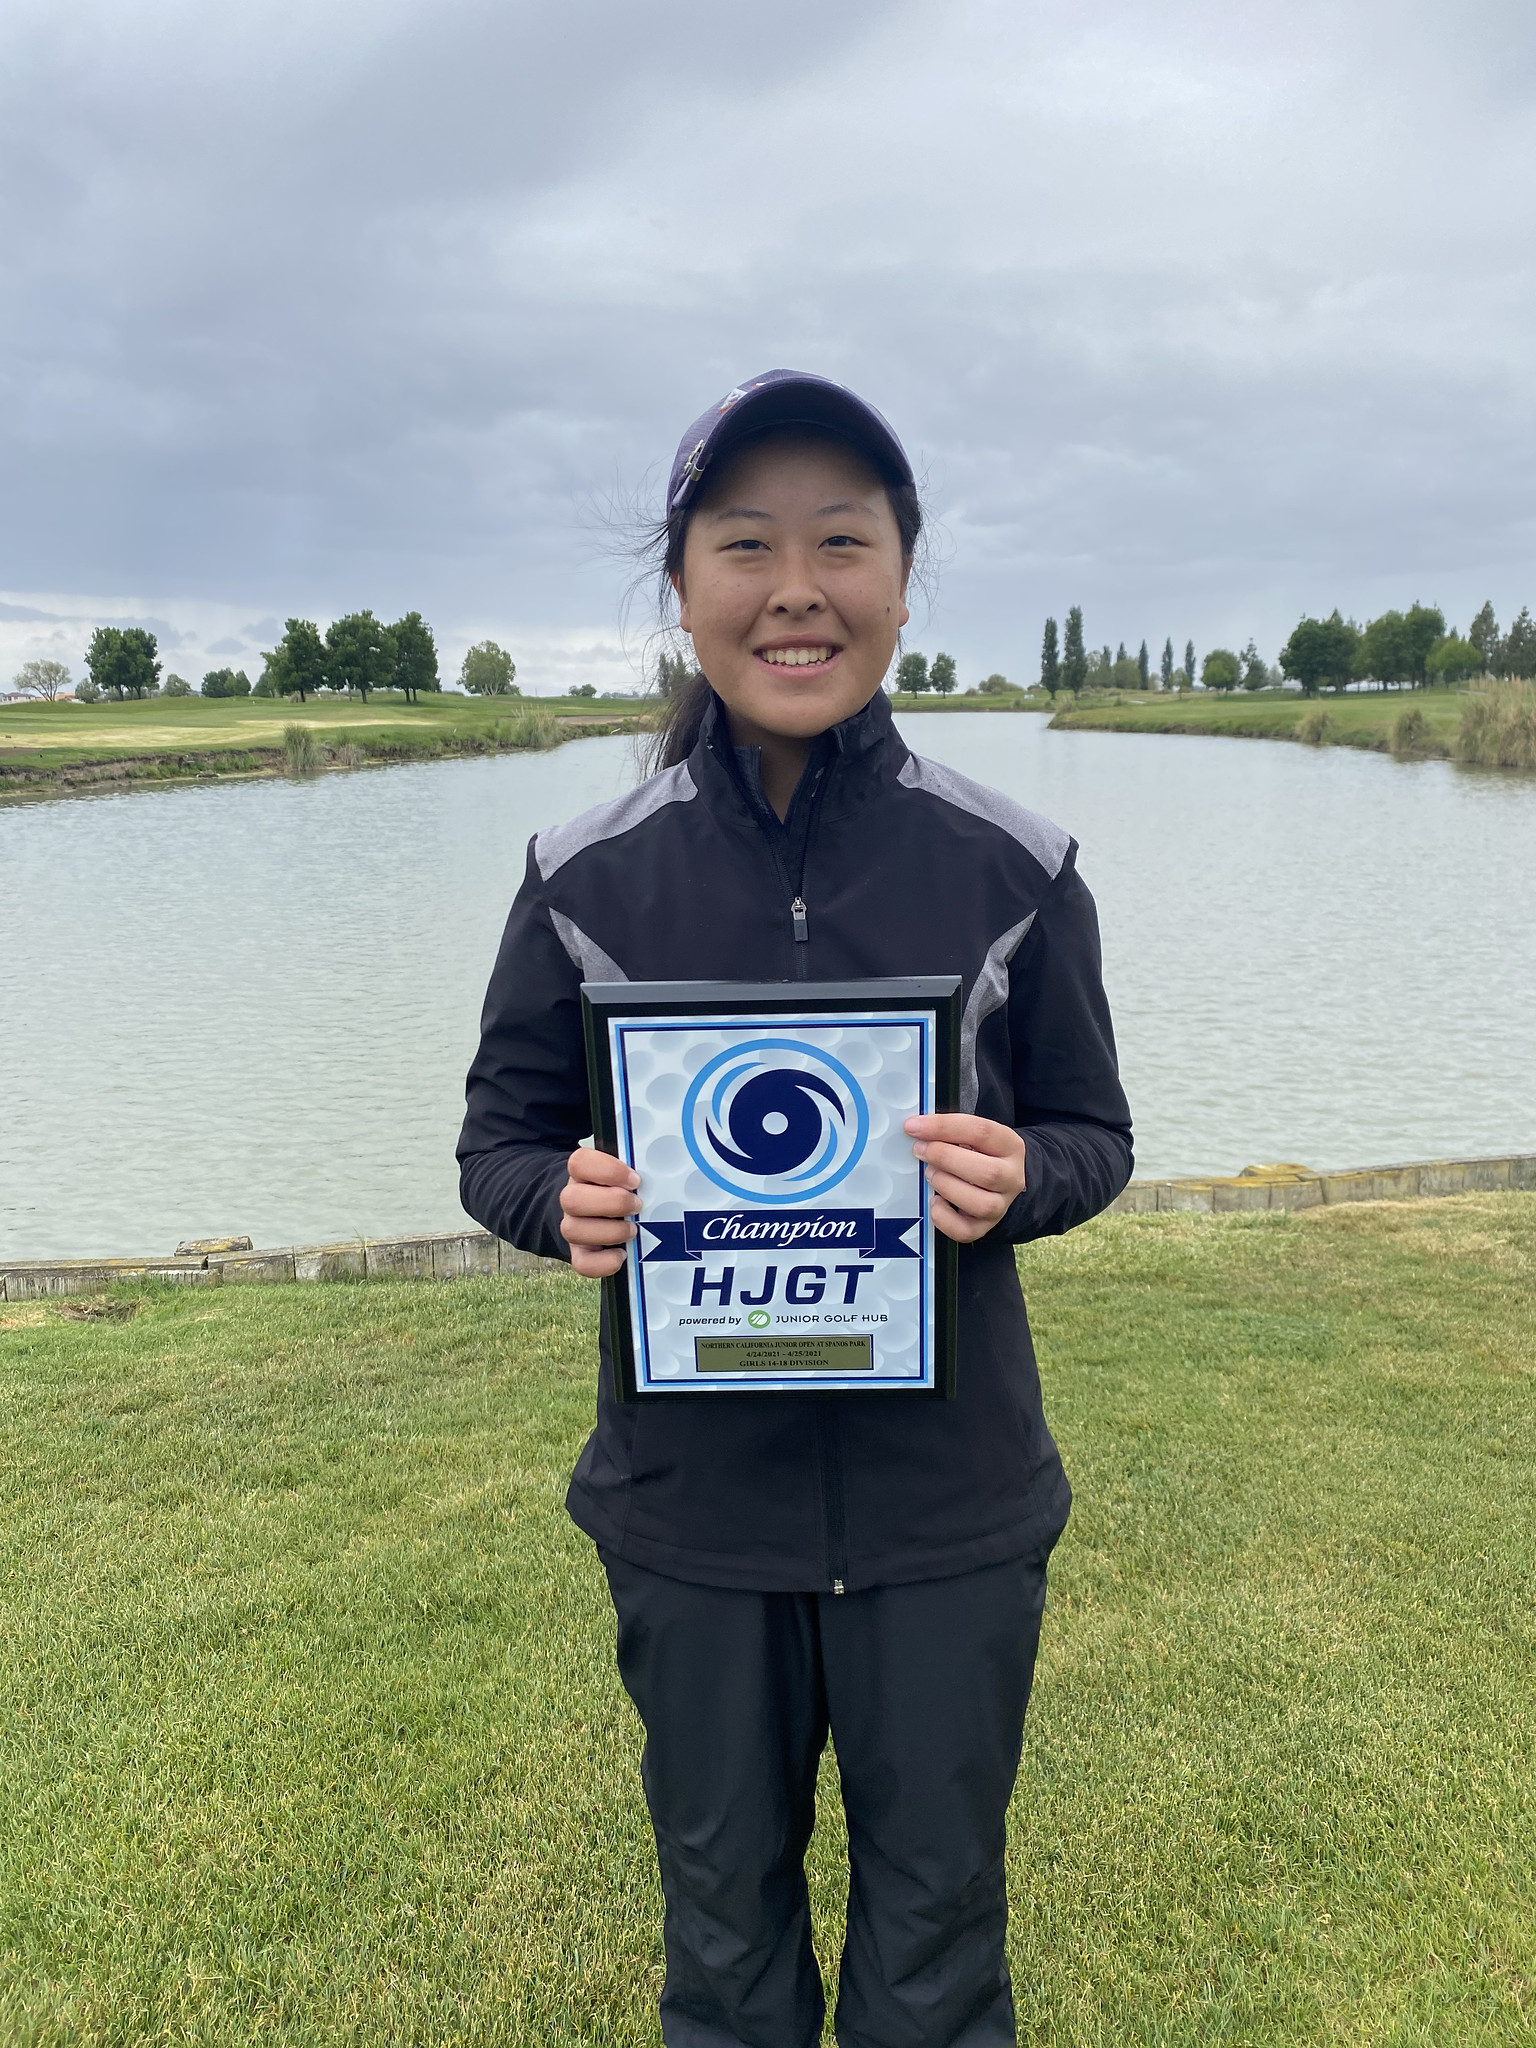 Northern California Junior Open at Spanos Park